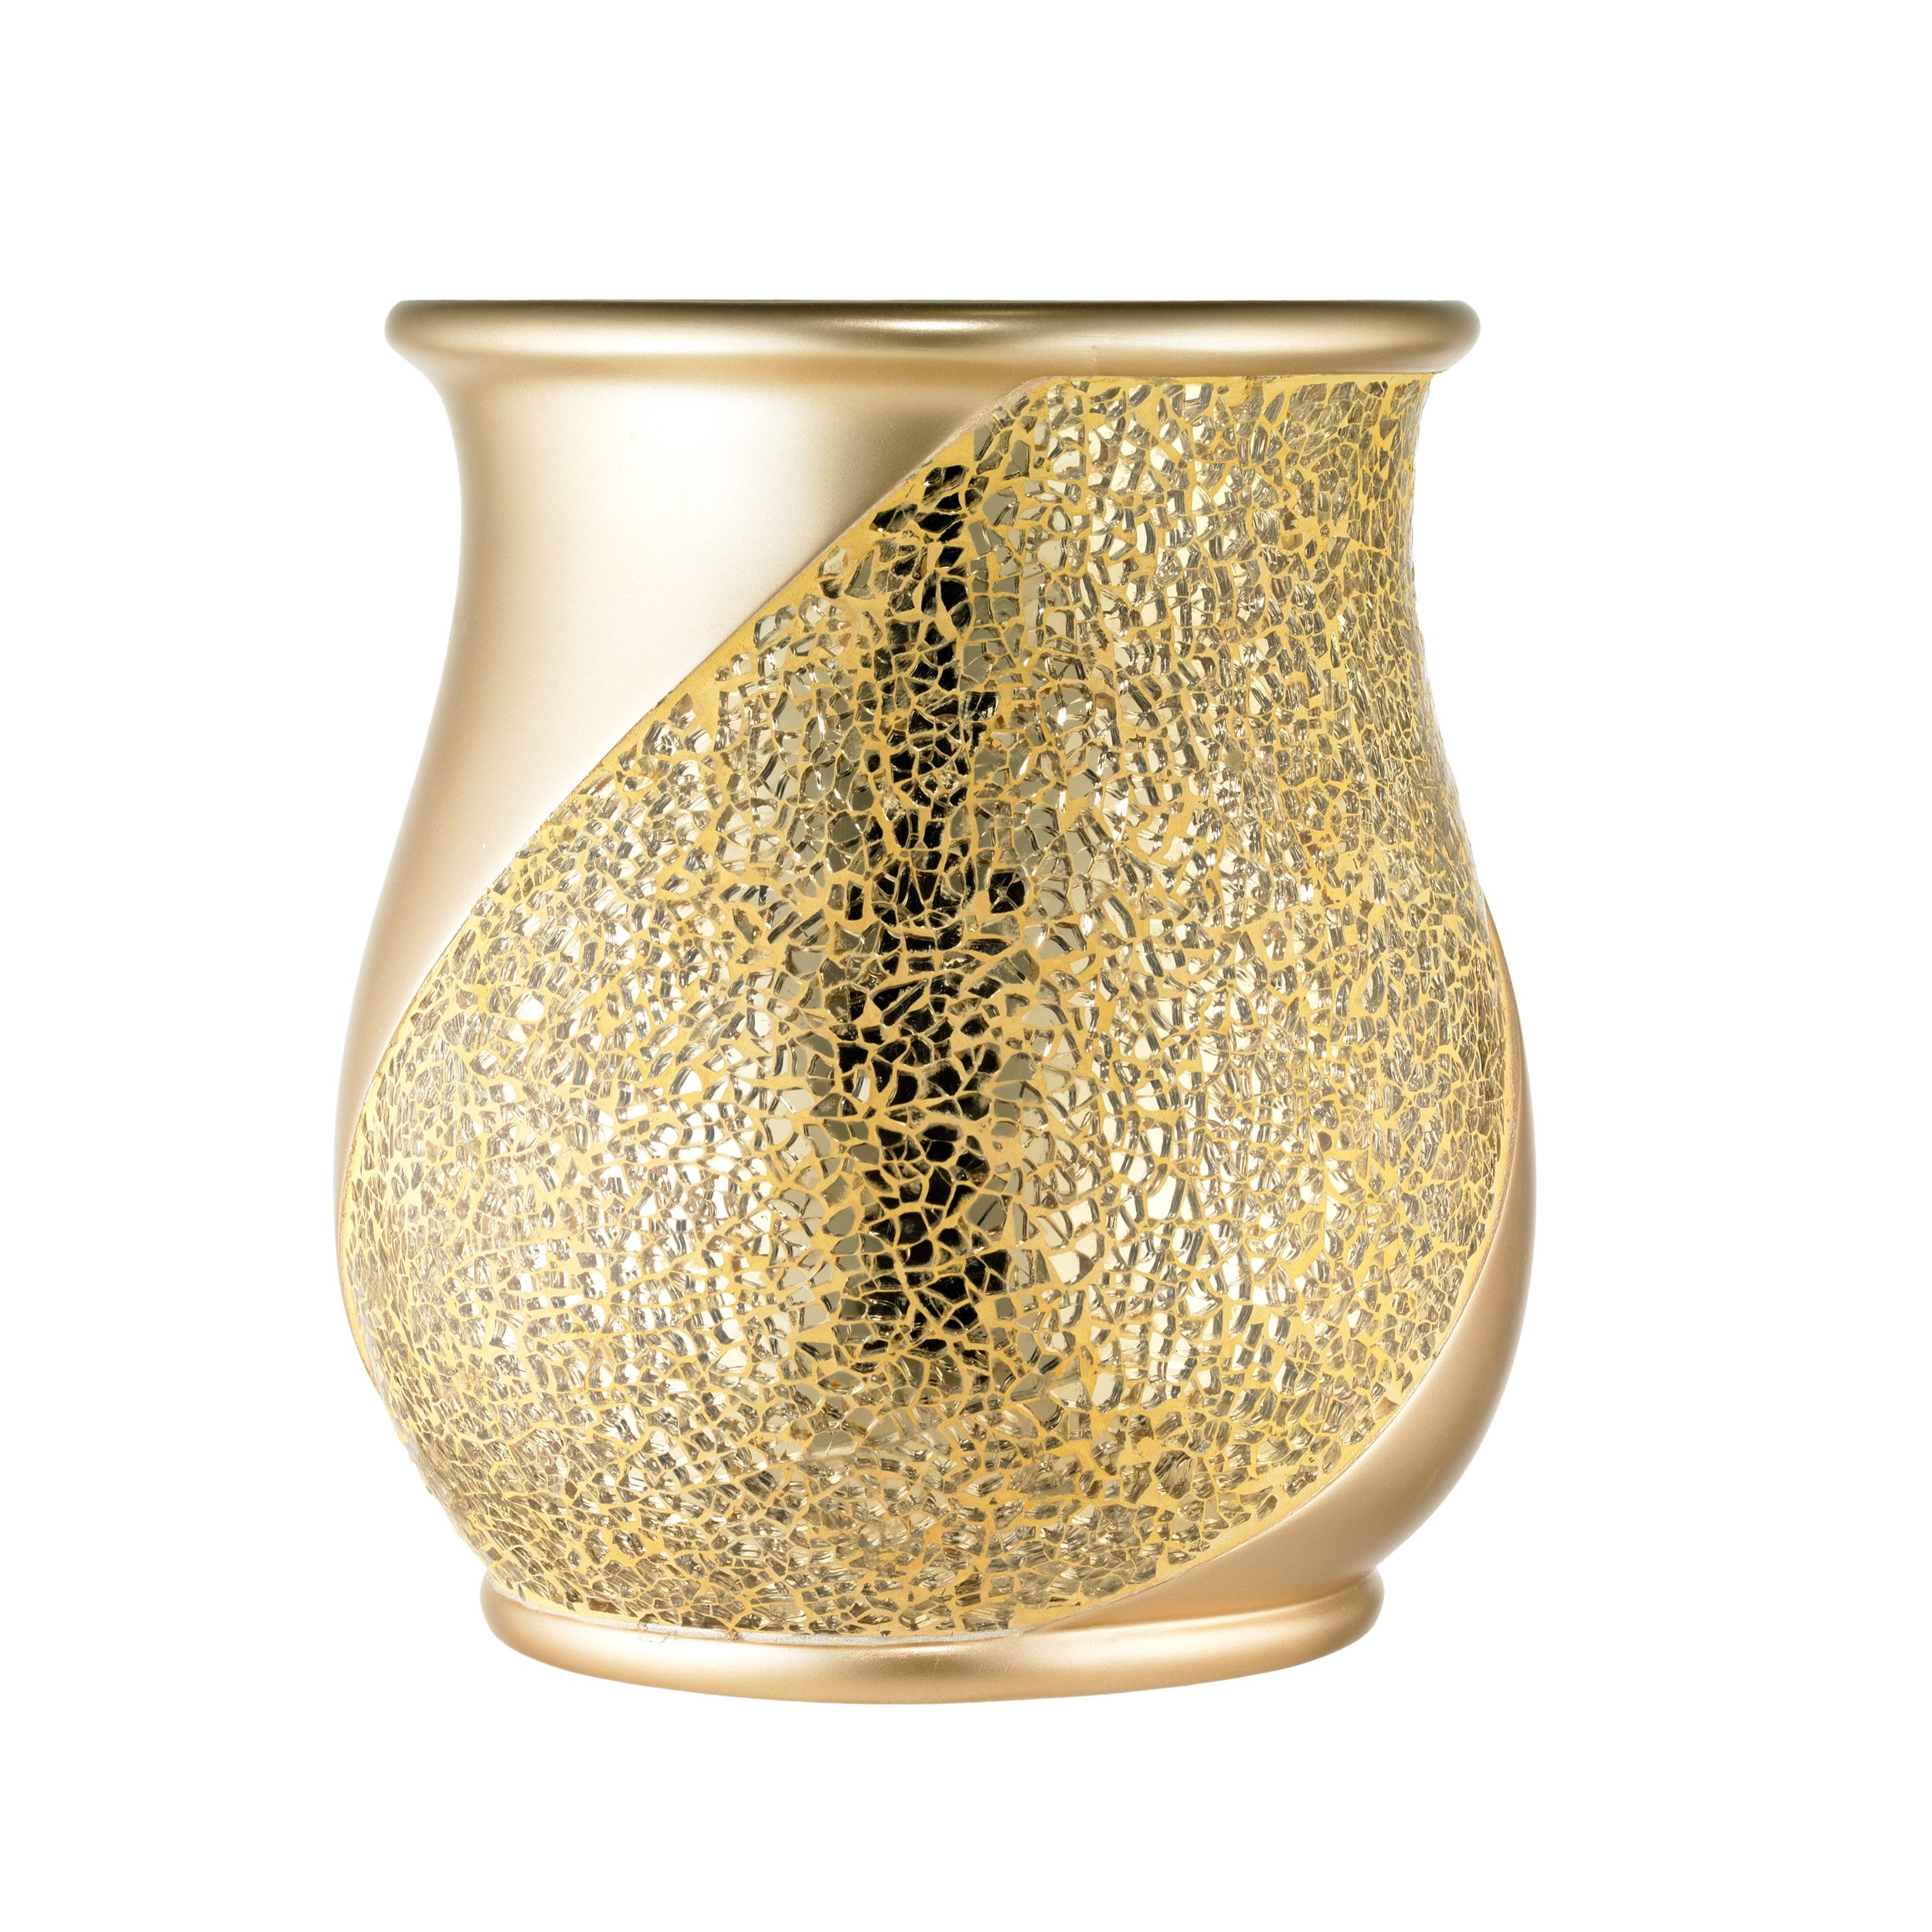 Popular Bath Waste Basket, Sinatra Collection, Champagne/Gold